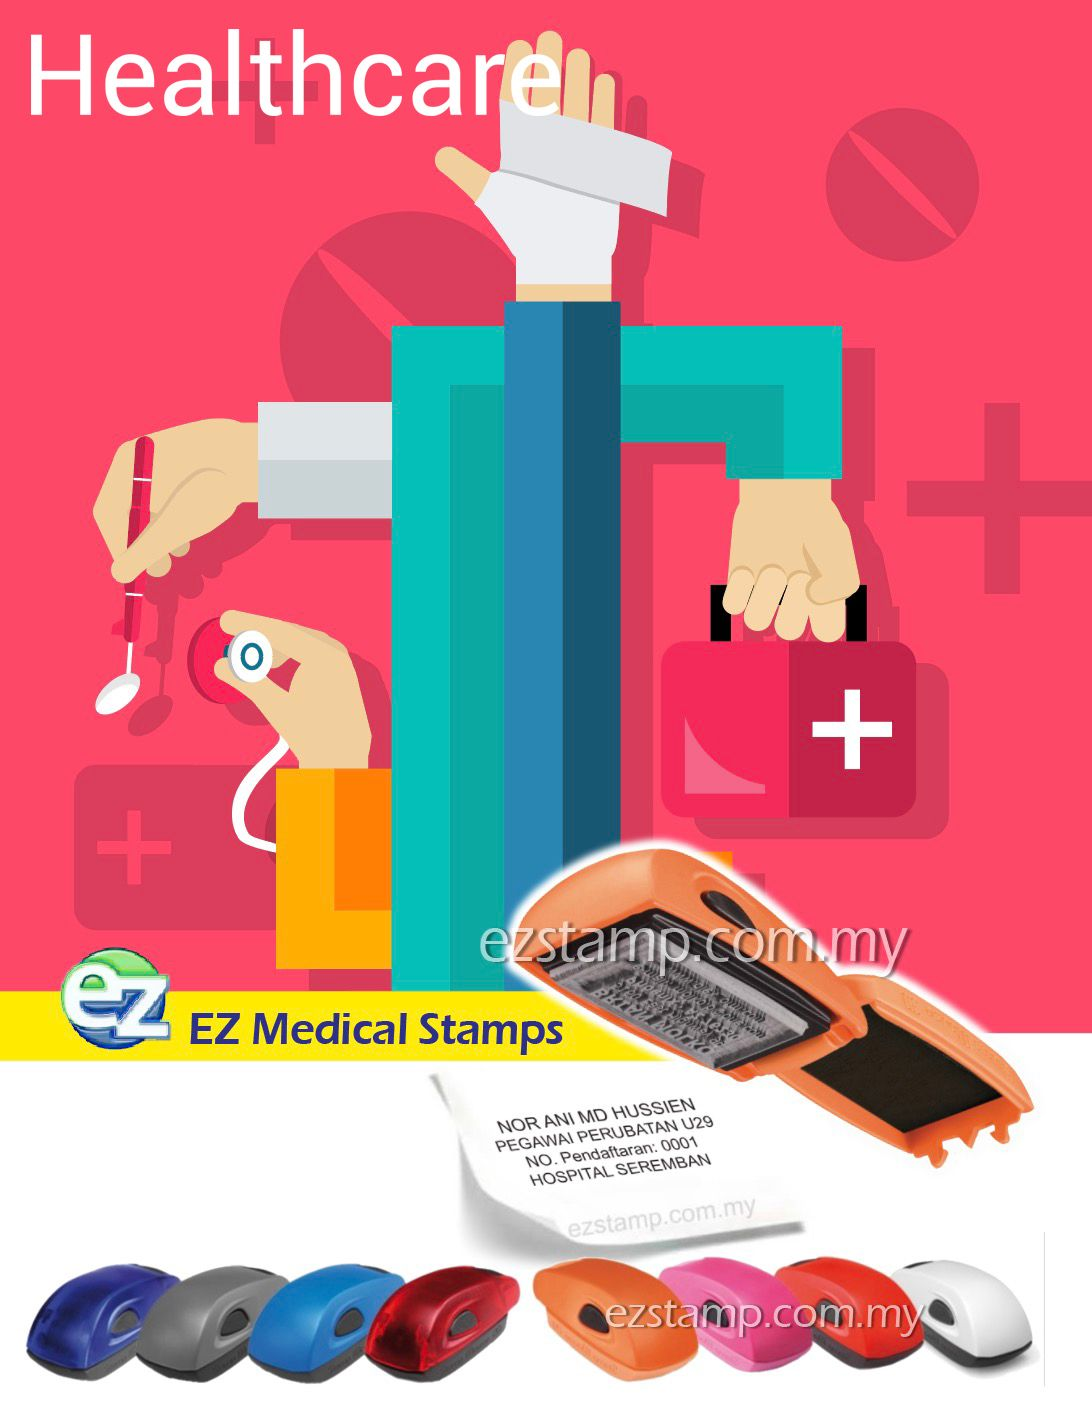 Ez Mouse Stamp Utk Pegawai Perubatan Nurses Doctor Di Malaysia Kami Ada Pelbagai Model Design Utk Dipilih Sila Klik Lin Medical Nurse Self Inking Stamps